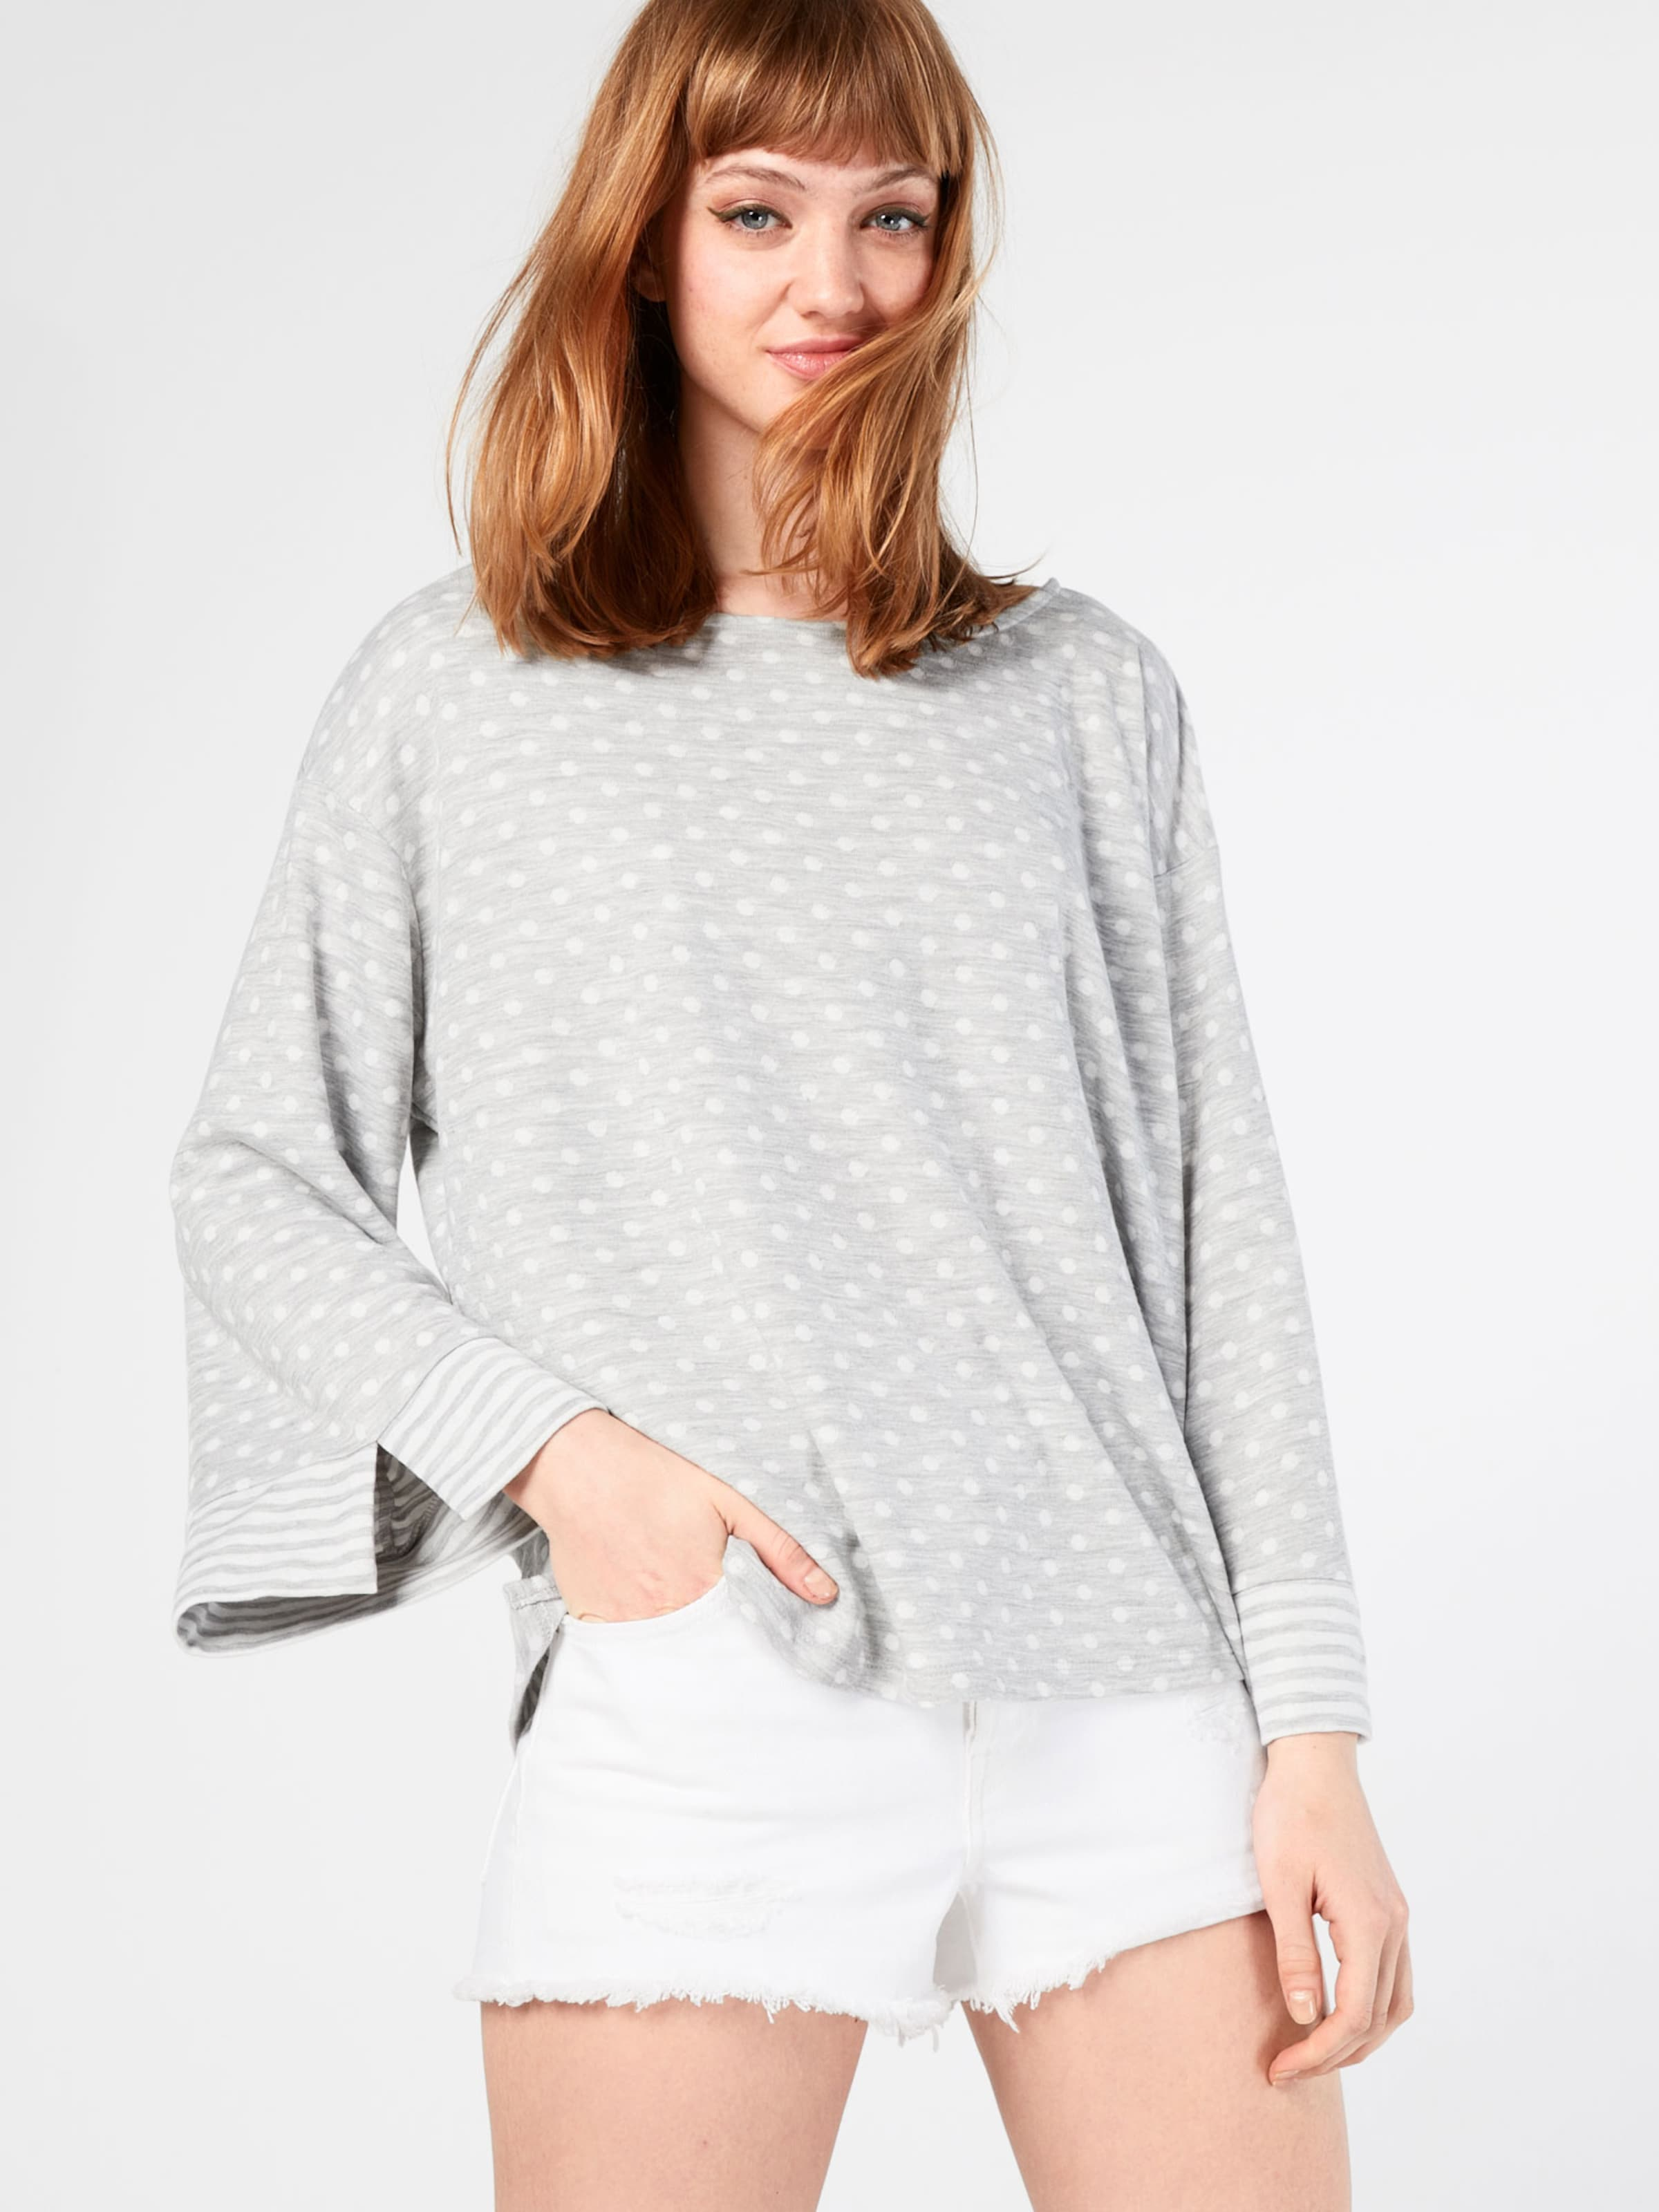 T By Edc En shirt ClairBlanc Esprit Gris 7mYIbyvfg6